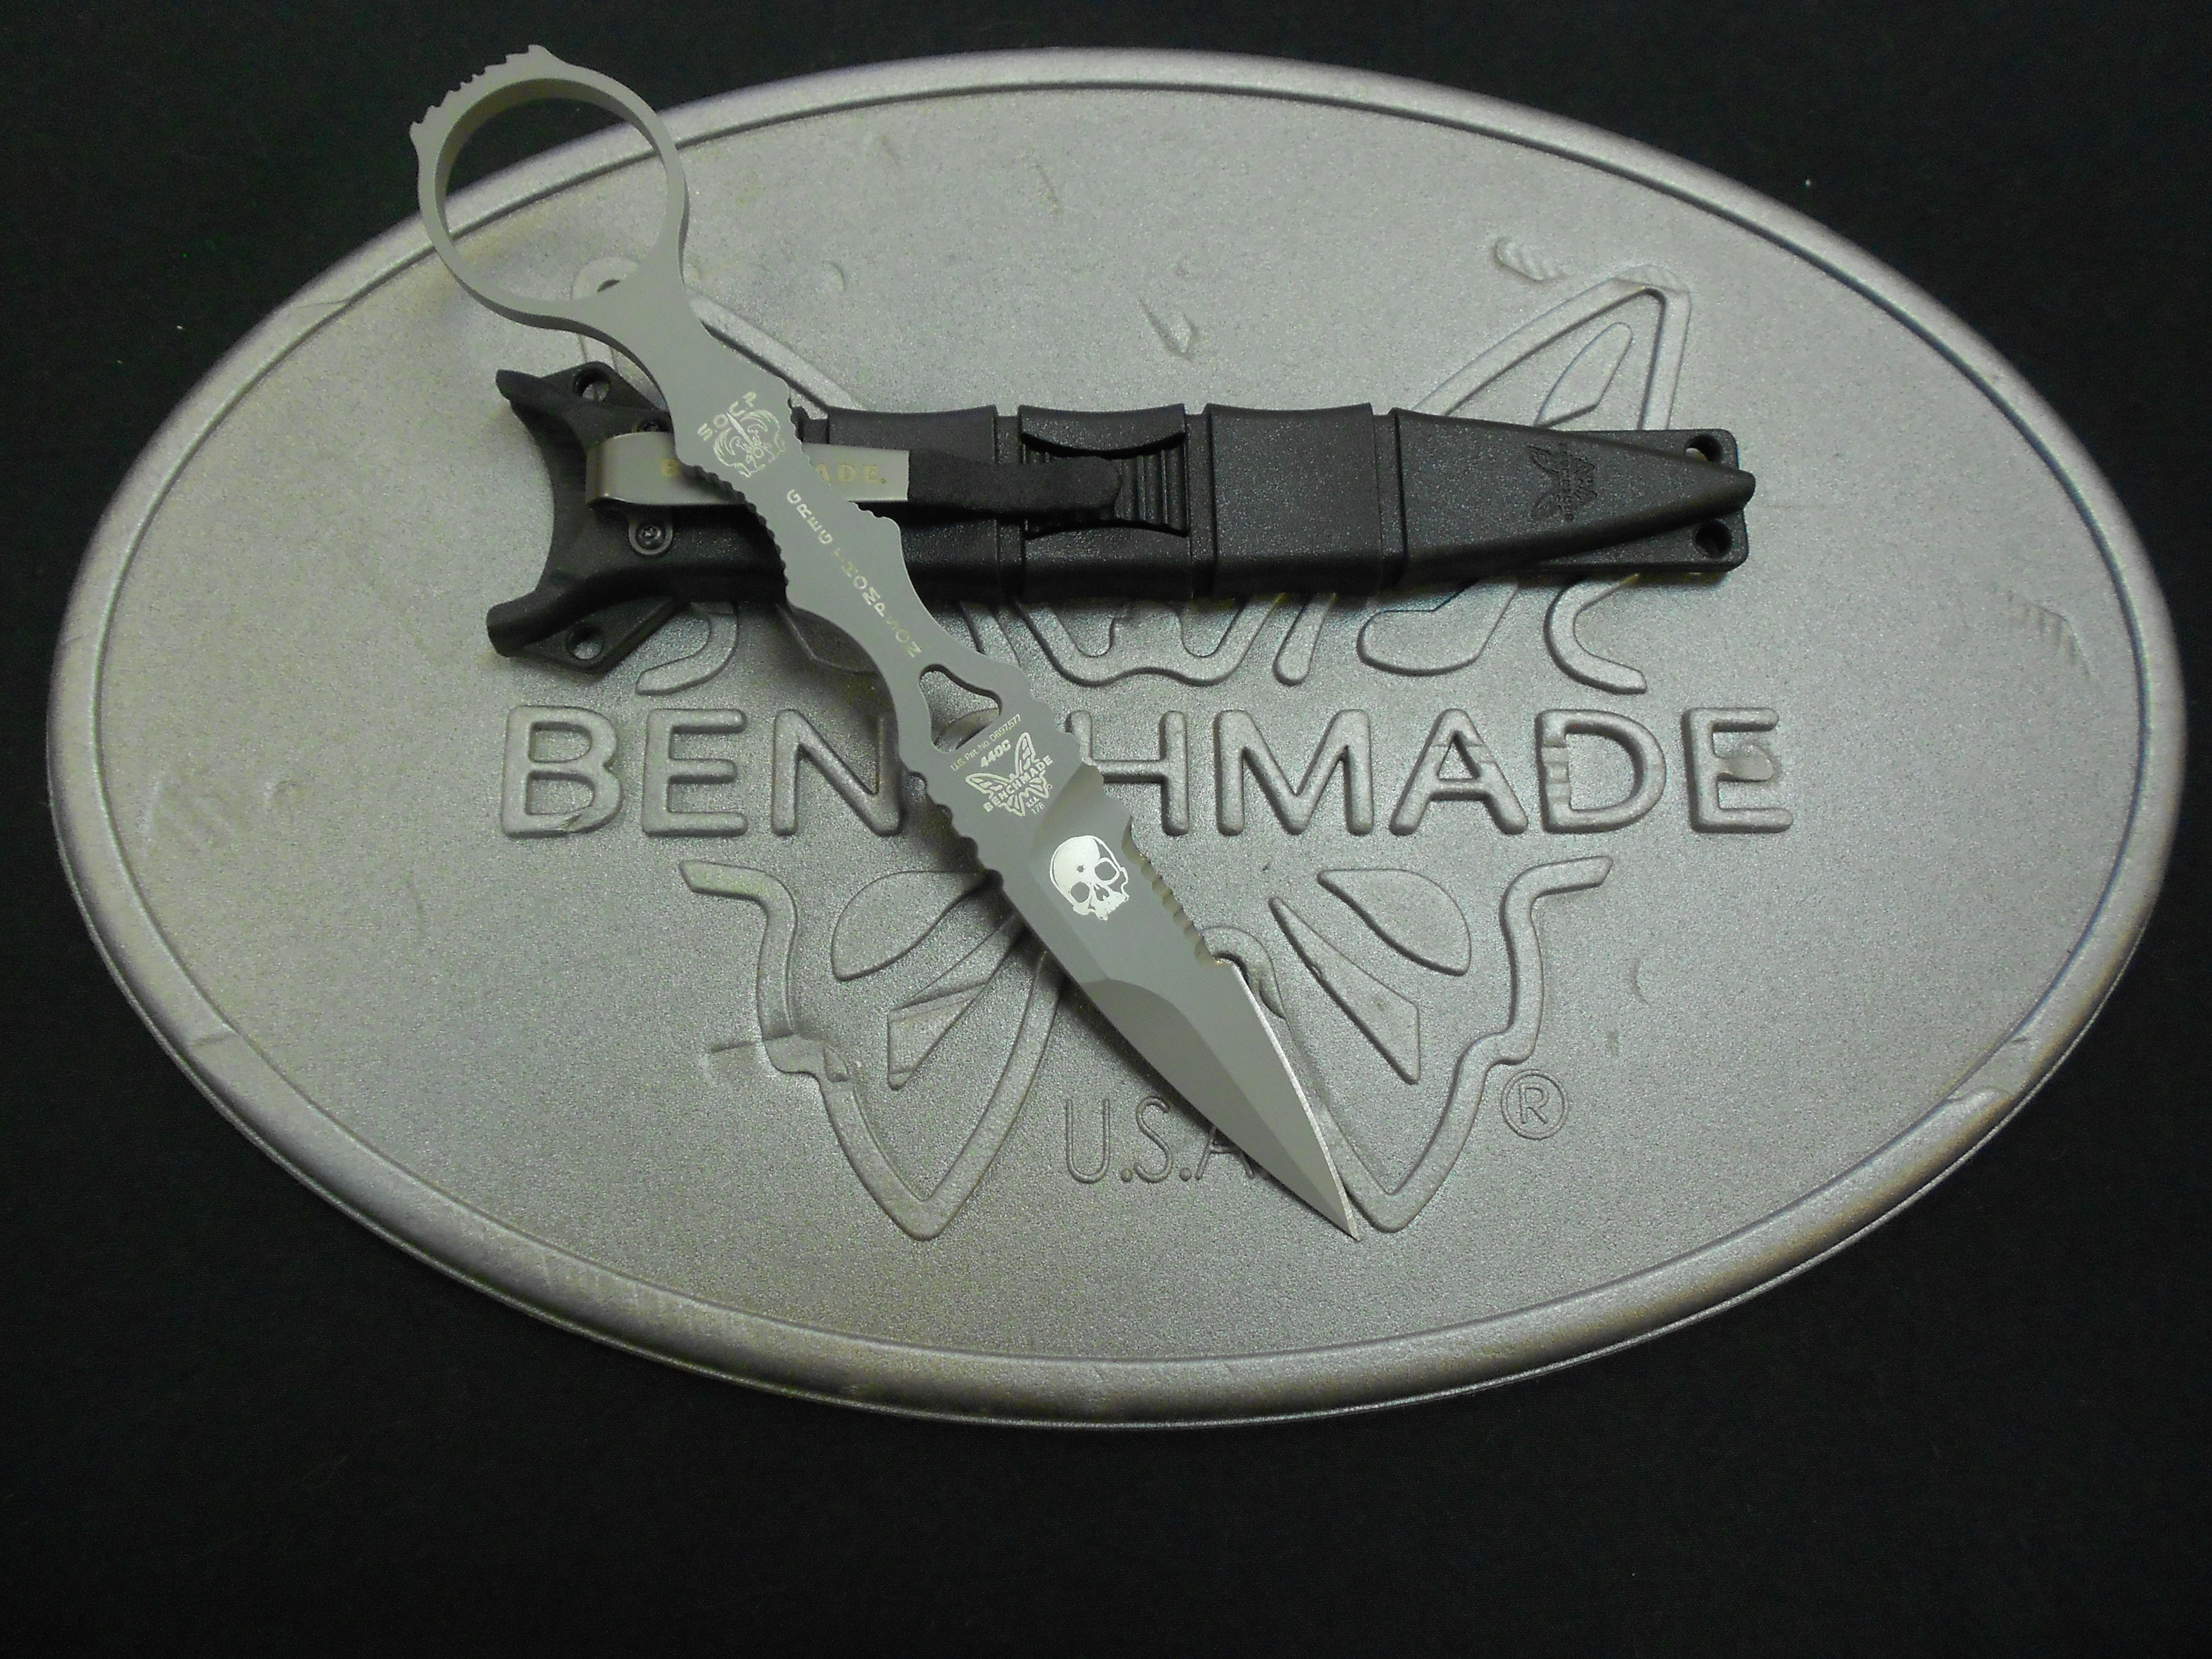 Benchmade 178SGRYAS SOCP American Sniper Knife